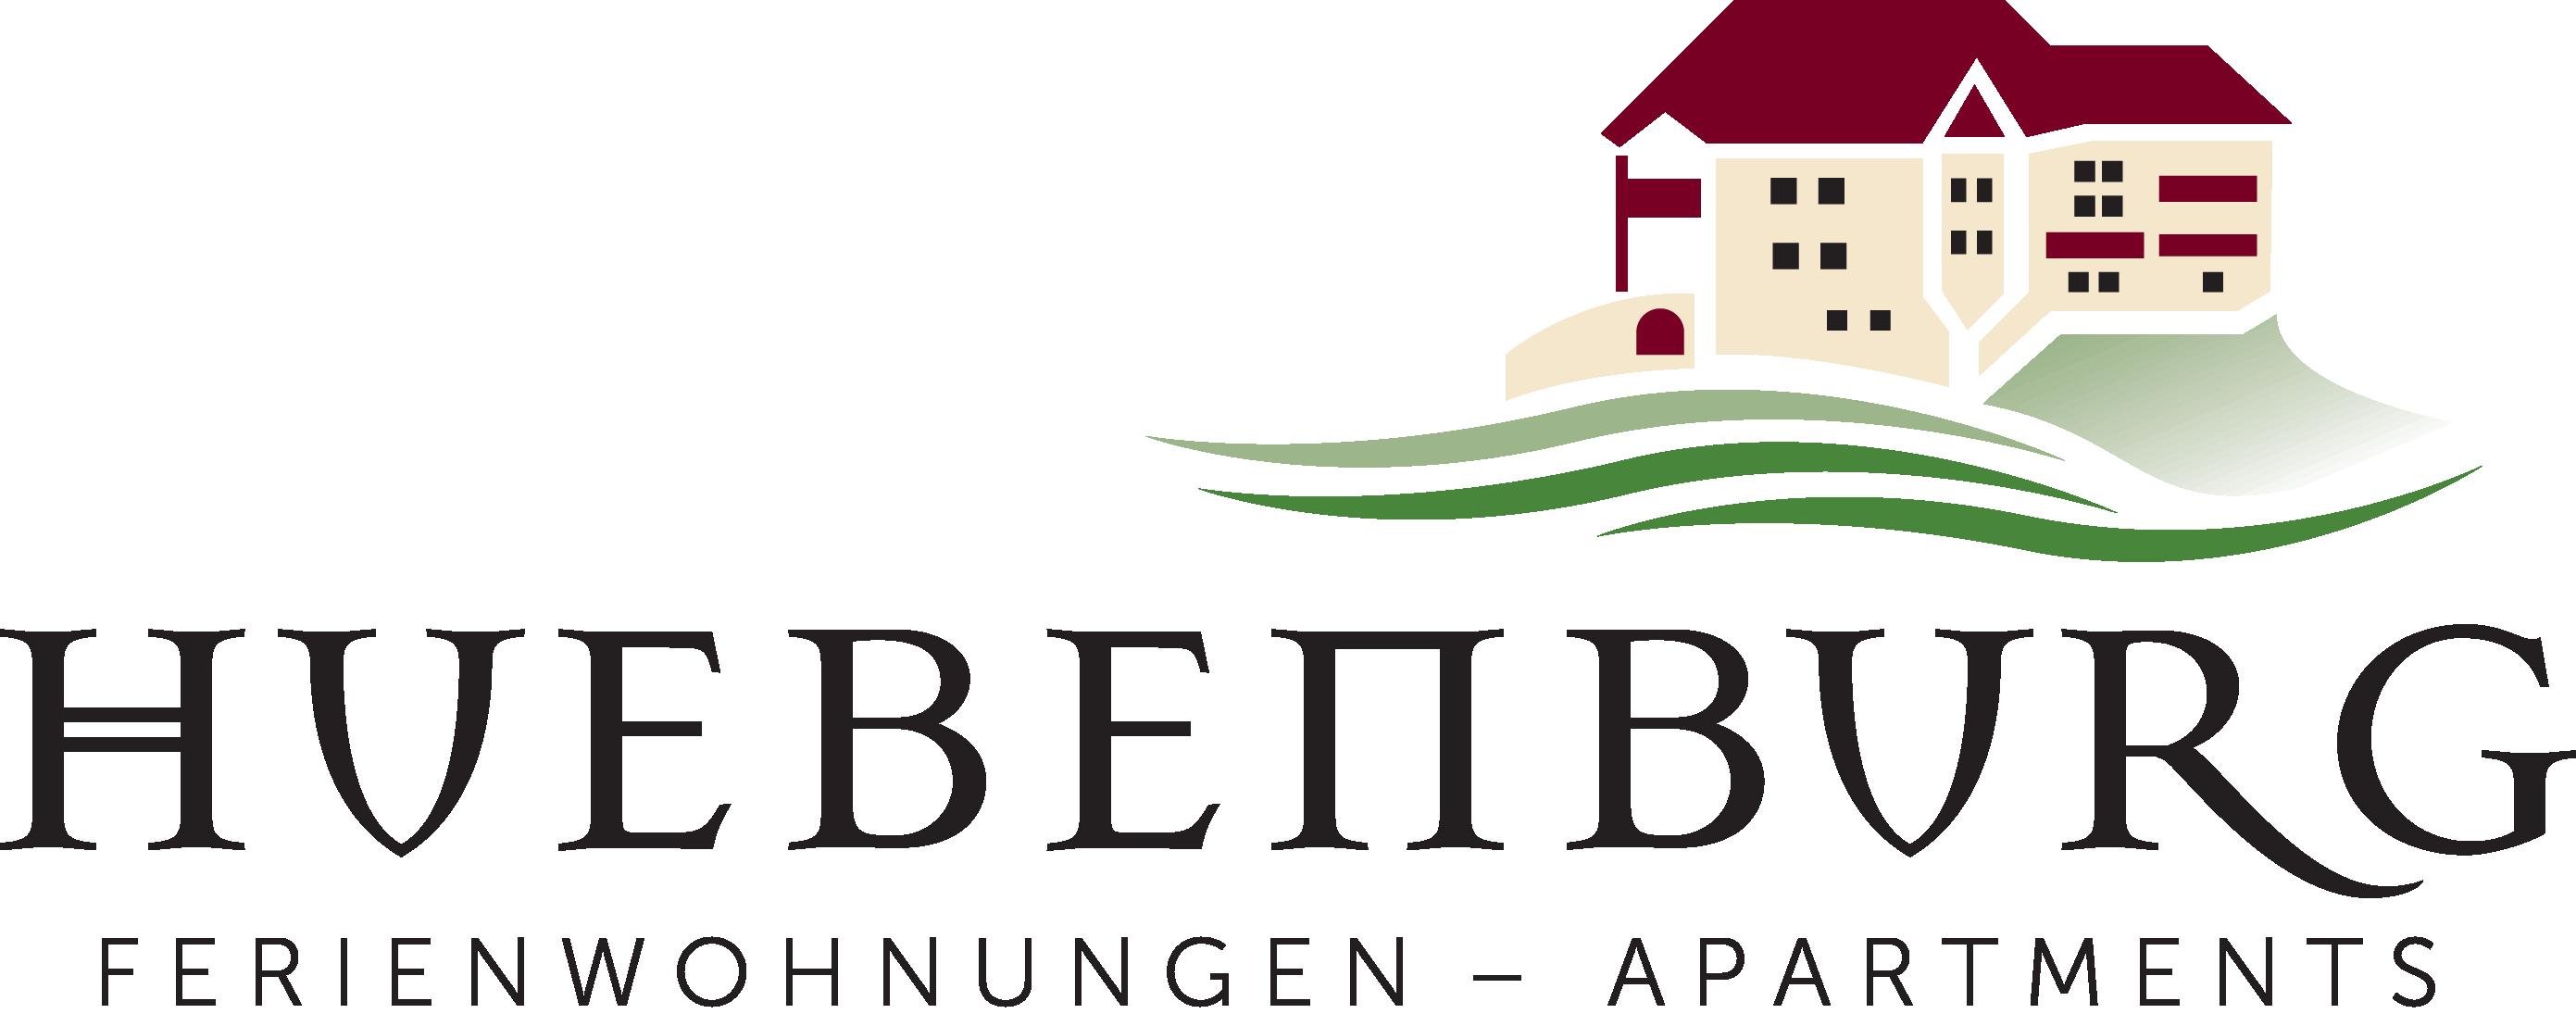 Huebenburg